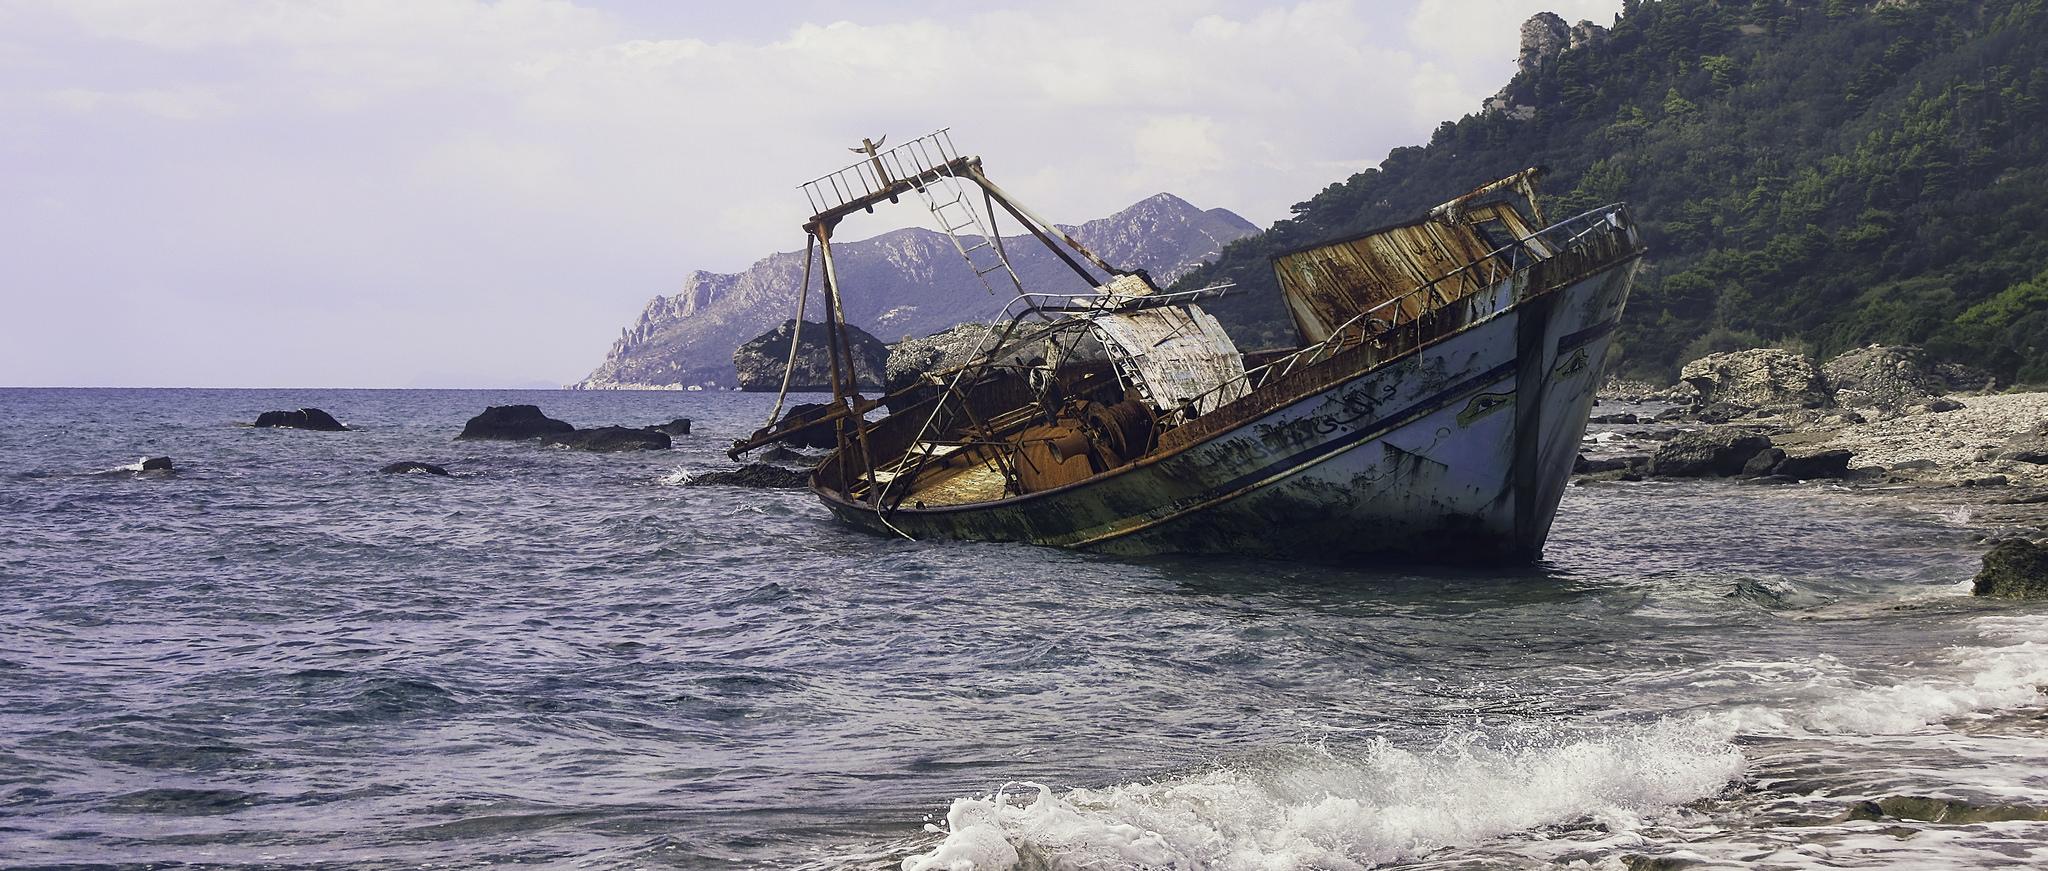 Robinson Crusoé 2016 [Klik om de diavoorstelling te starten]